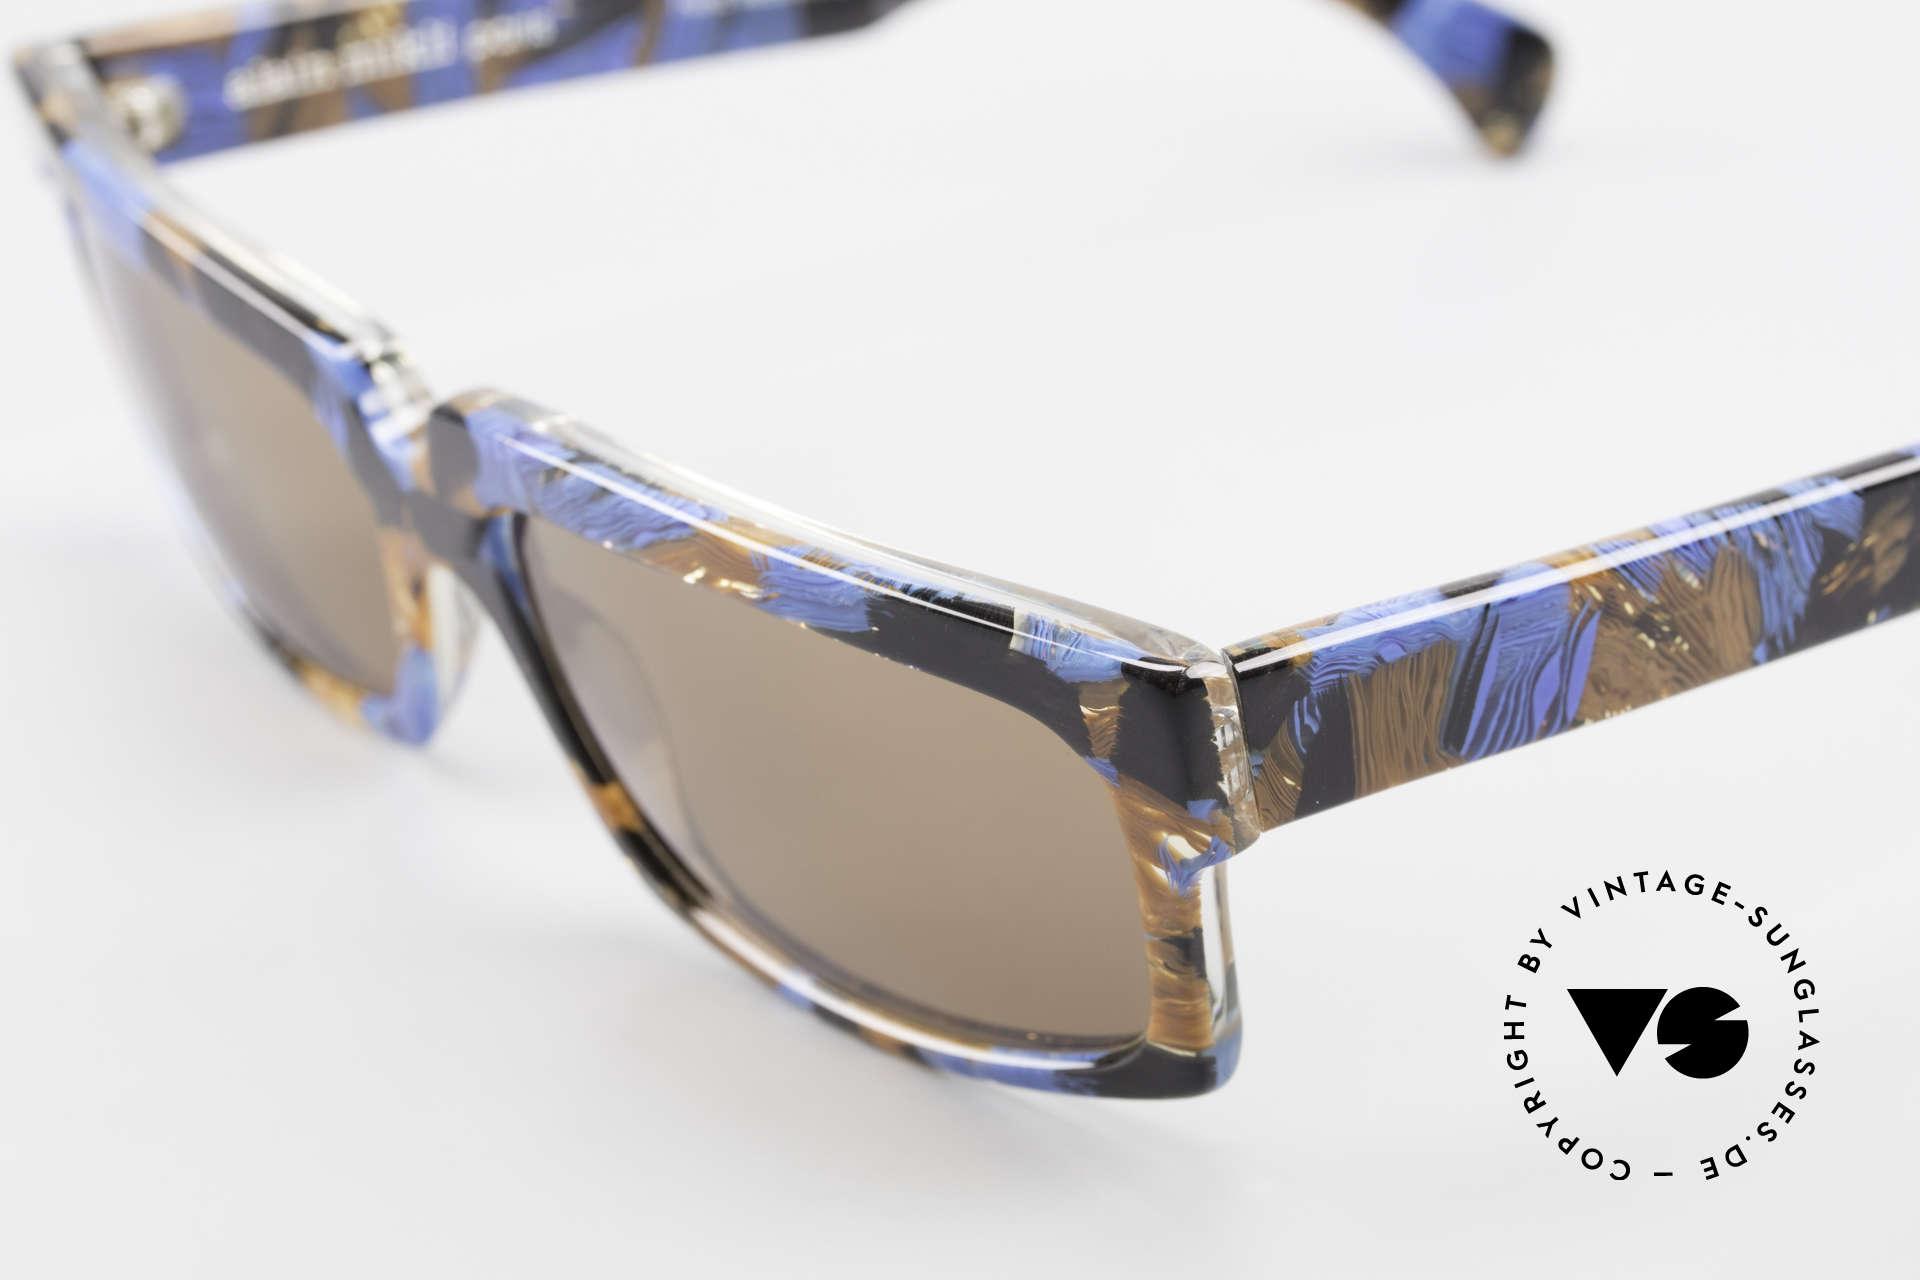 Alain Mikli 706 / 395 XL 80's Designer Sunglasses, never worn (like all our vintage Alain Mikli specs), Made for Men